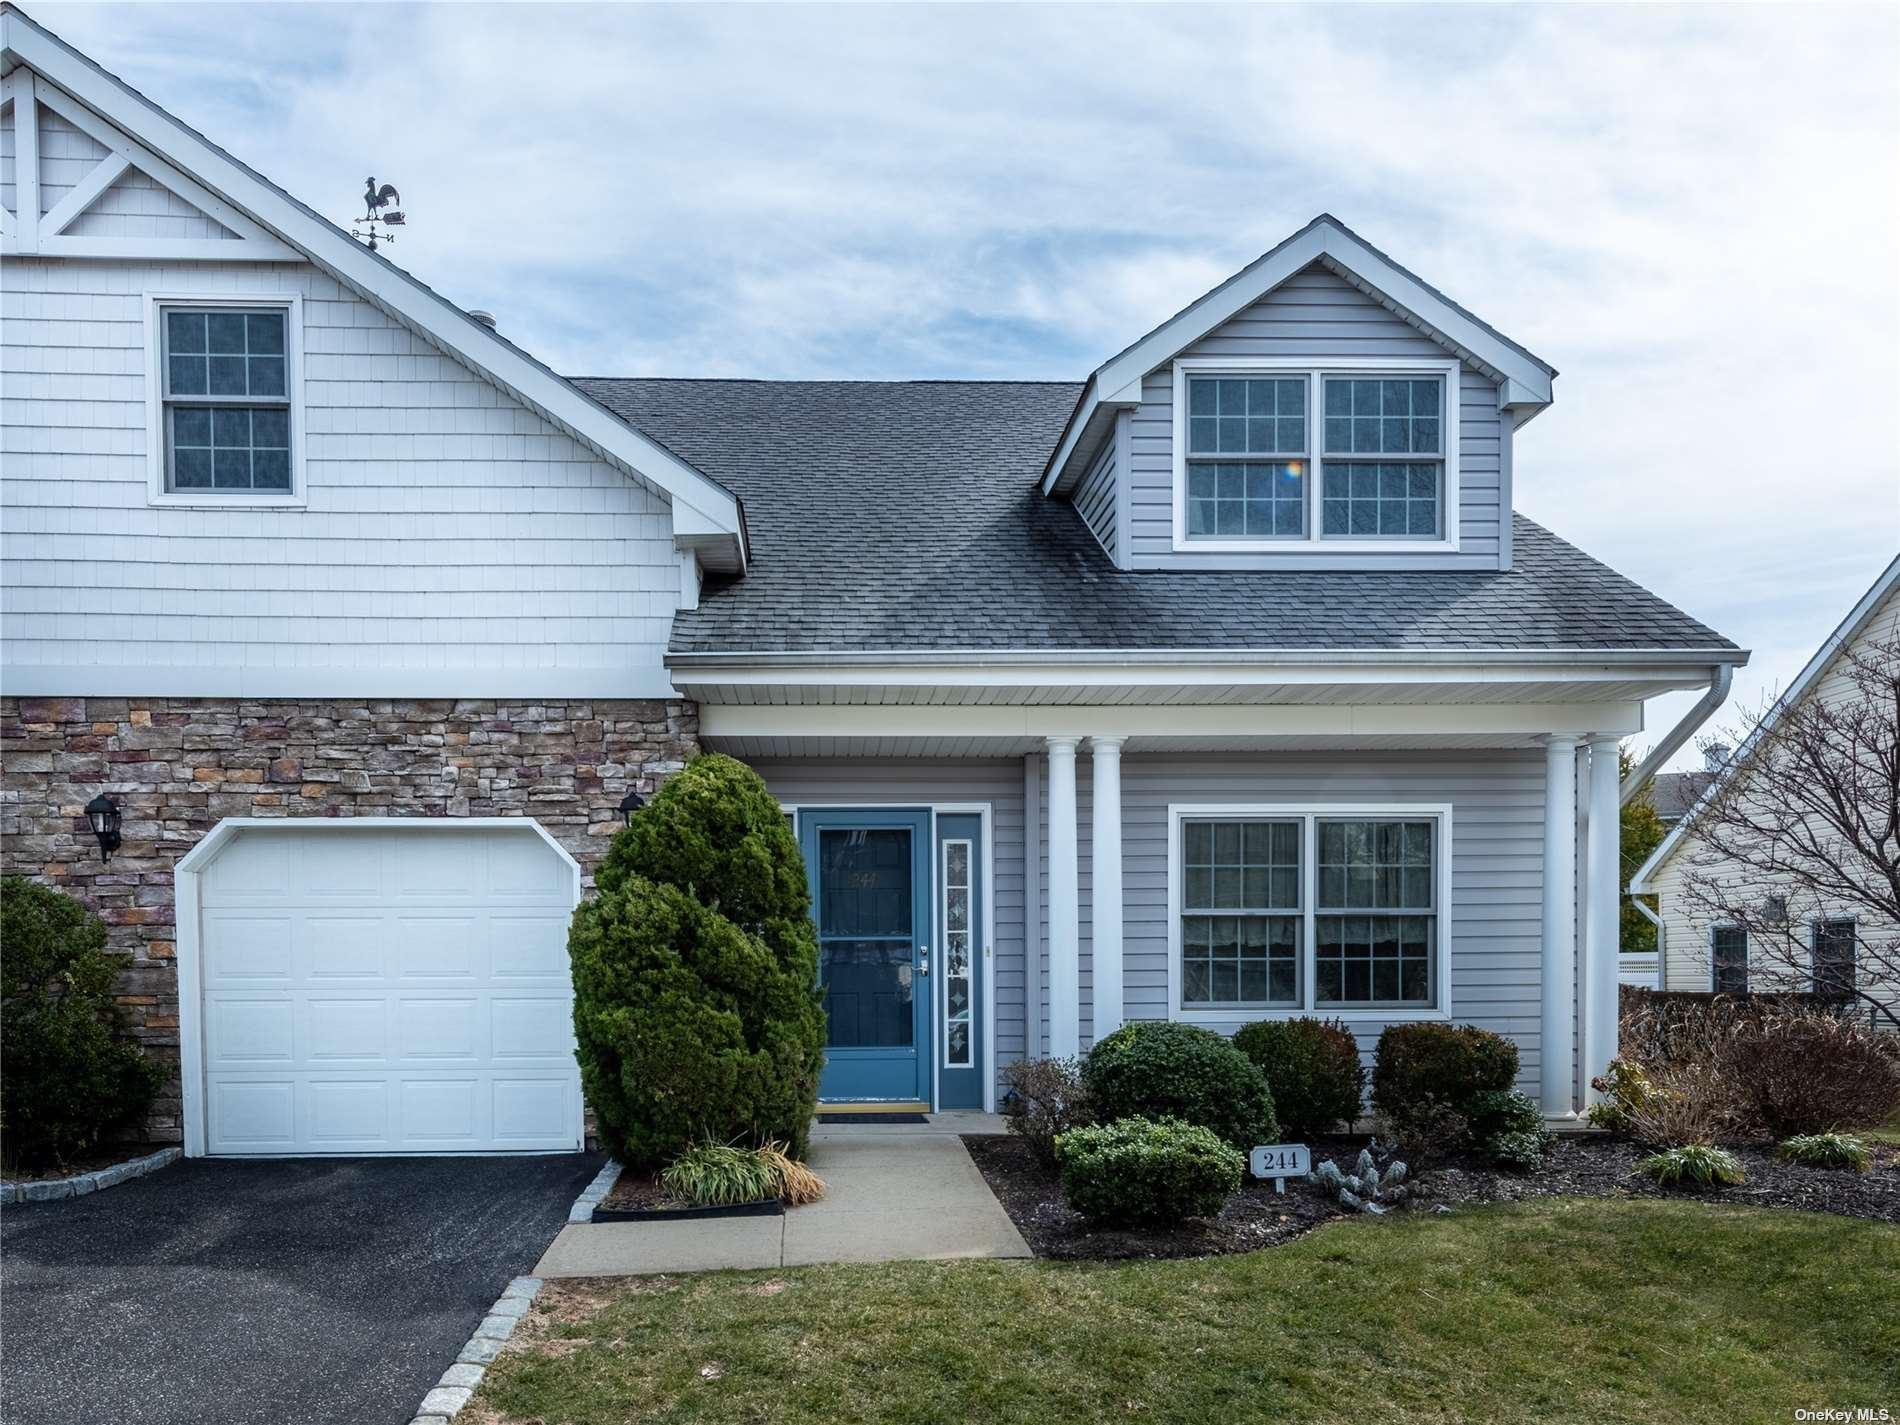 244 Pond View Drive, Port Washington, NY 11050 - MLS#: 3297193